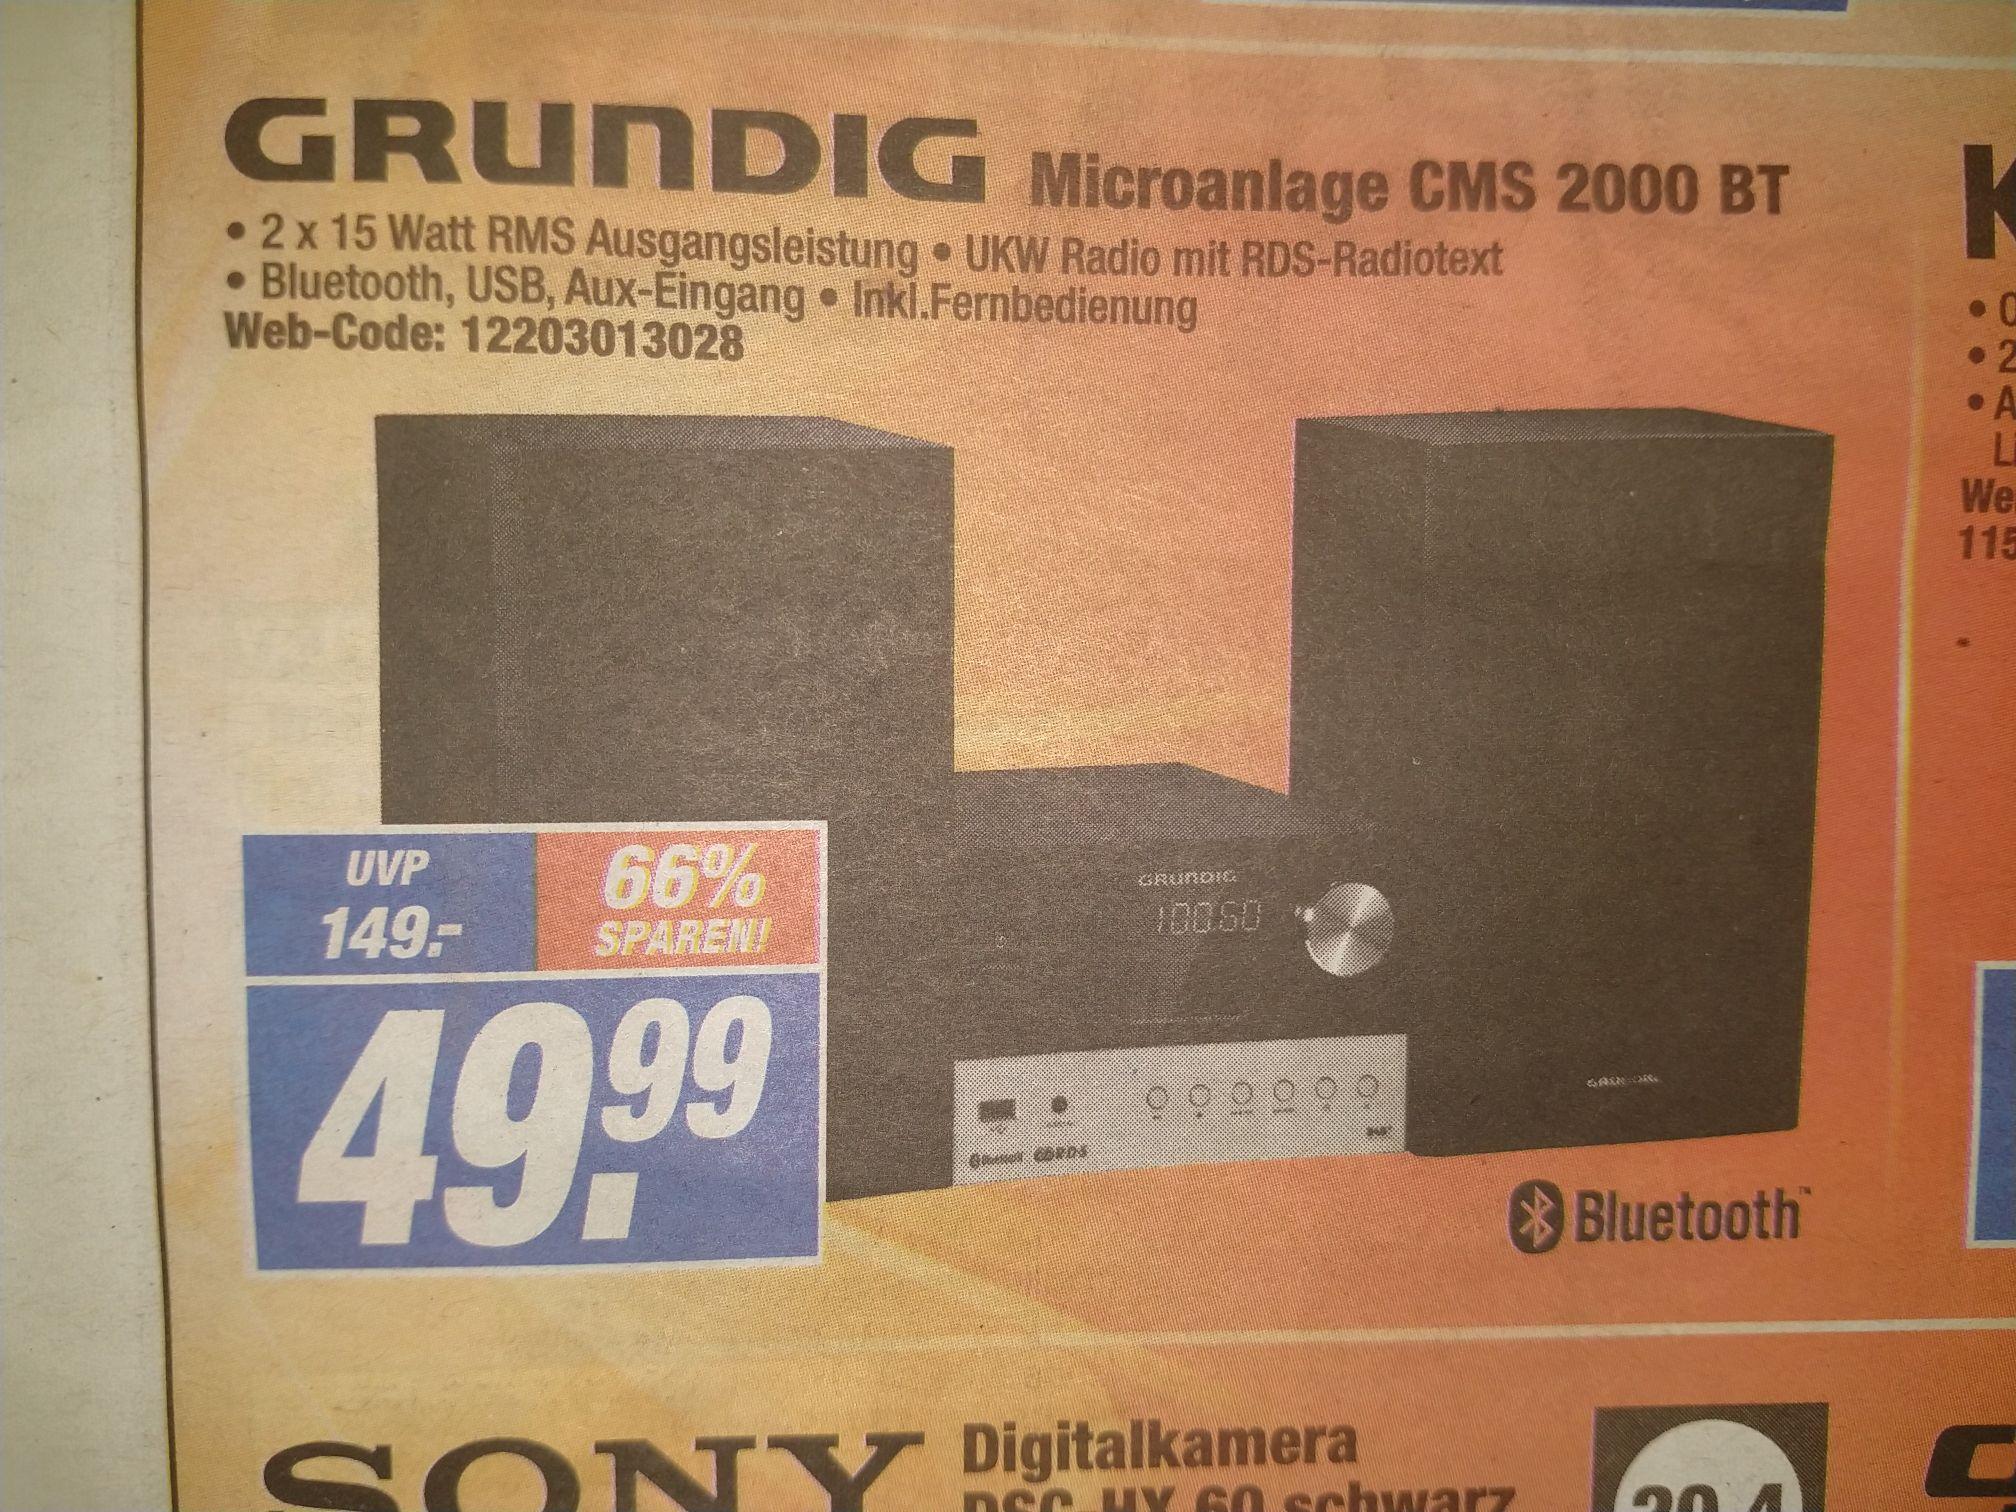 Grundig Microanlage CMS 2000 BT (Expert, Lokal)